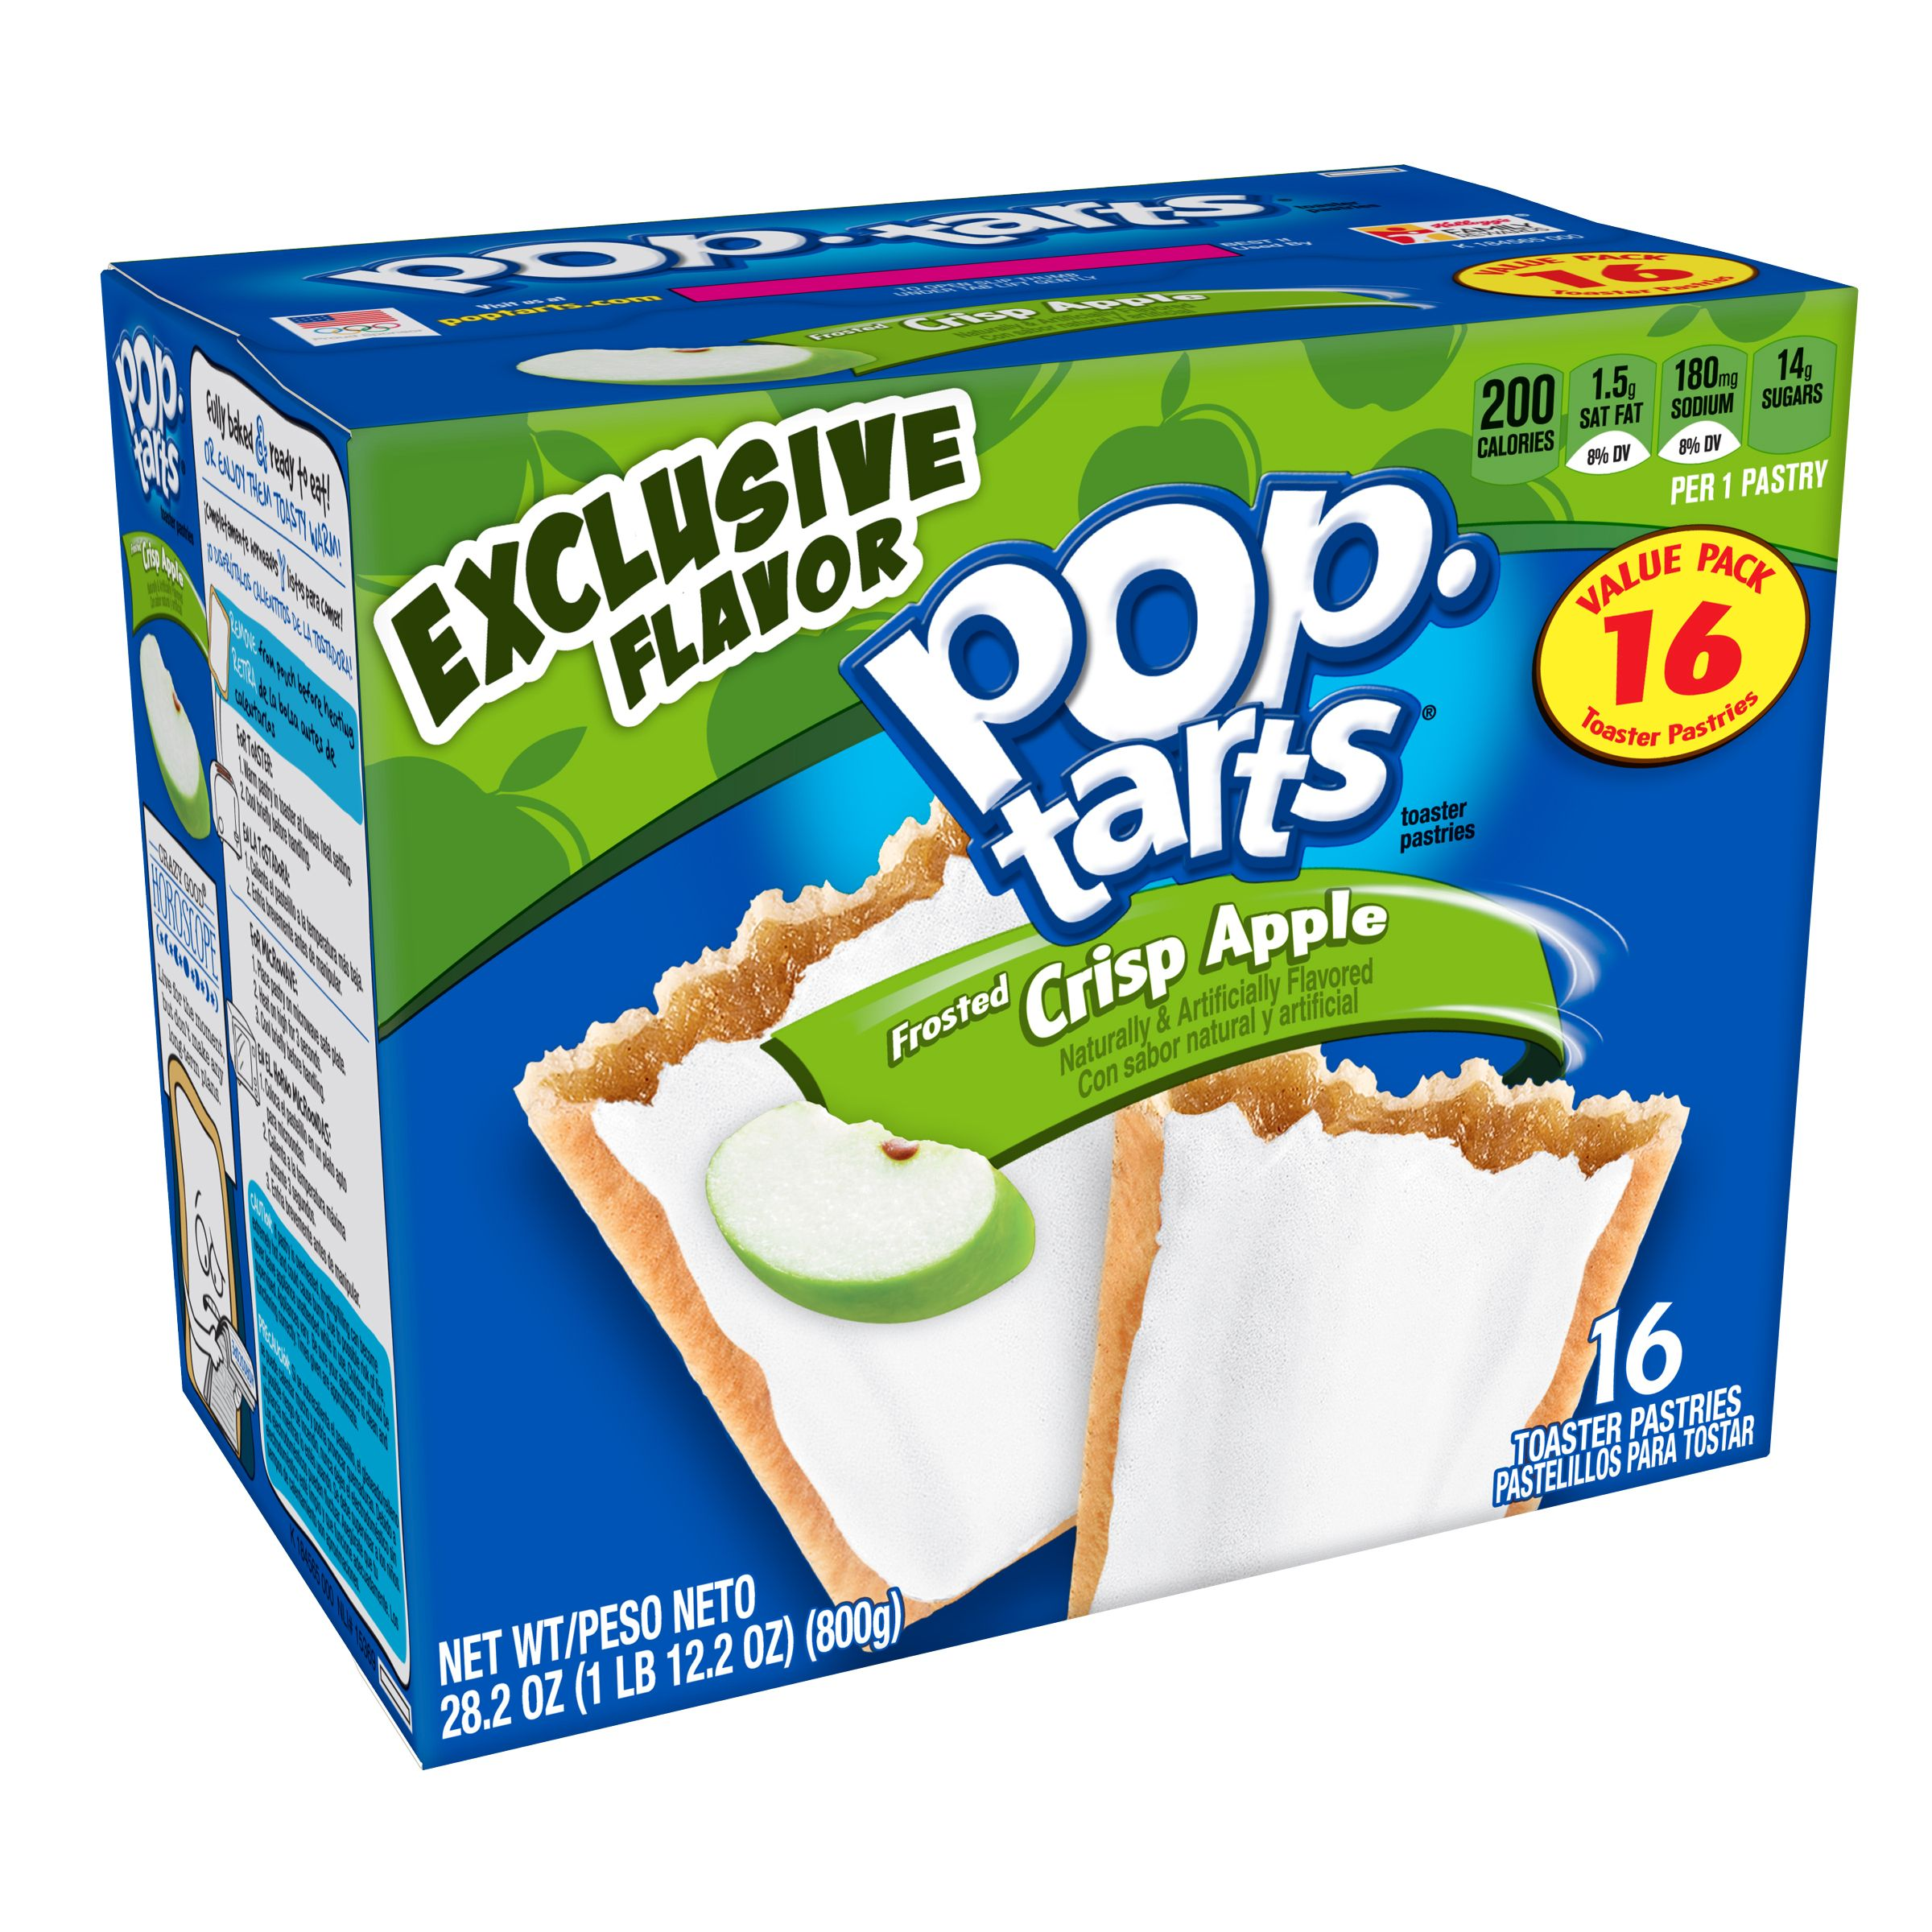 Kellogg's Pop-Tarts Frosted Crisp Apple Breakfast Toaster Pastries Value Pack 28.2oz16 Ct